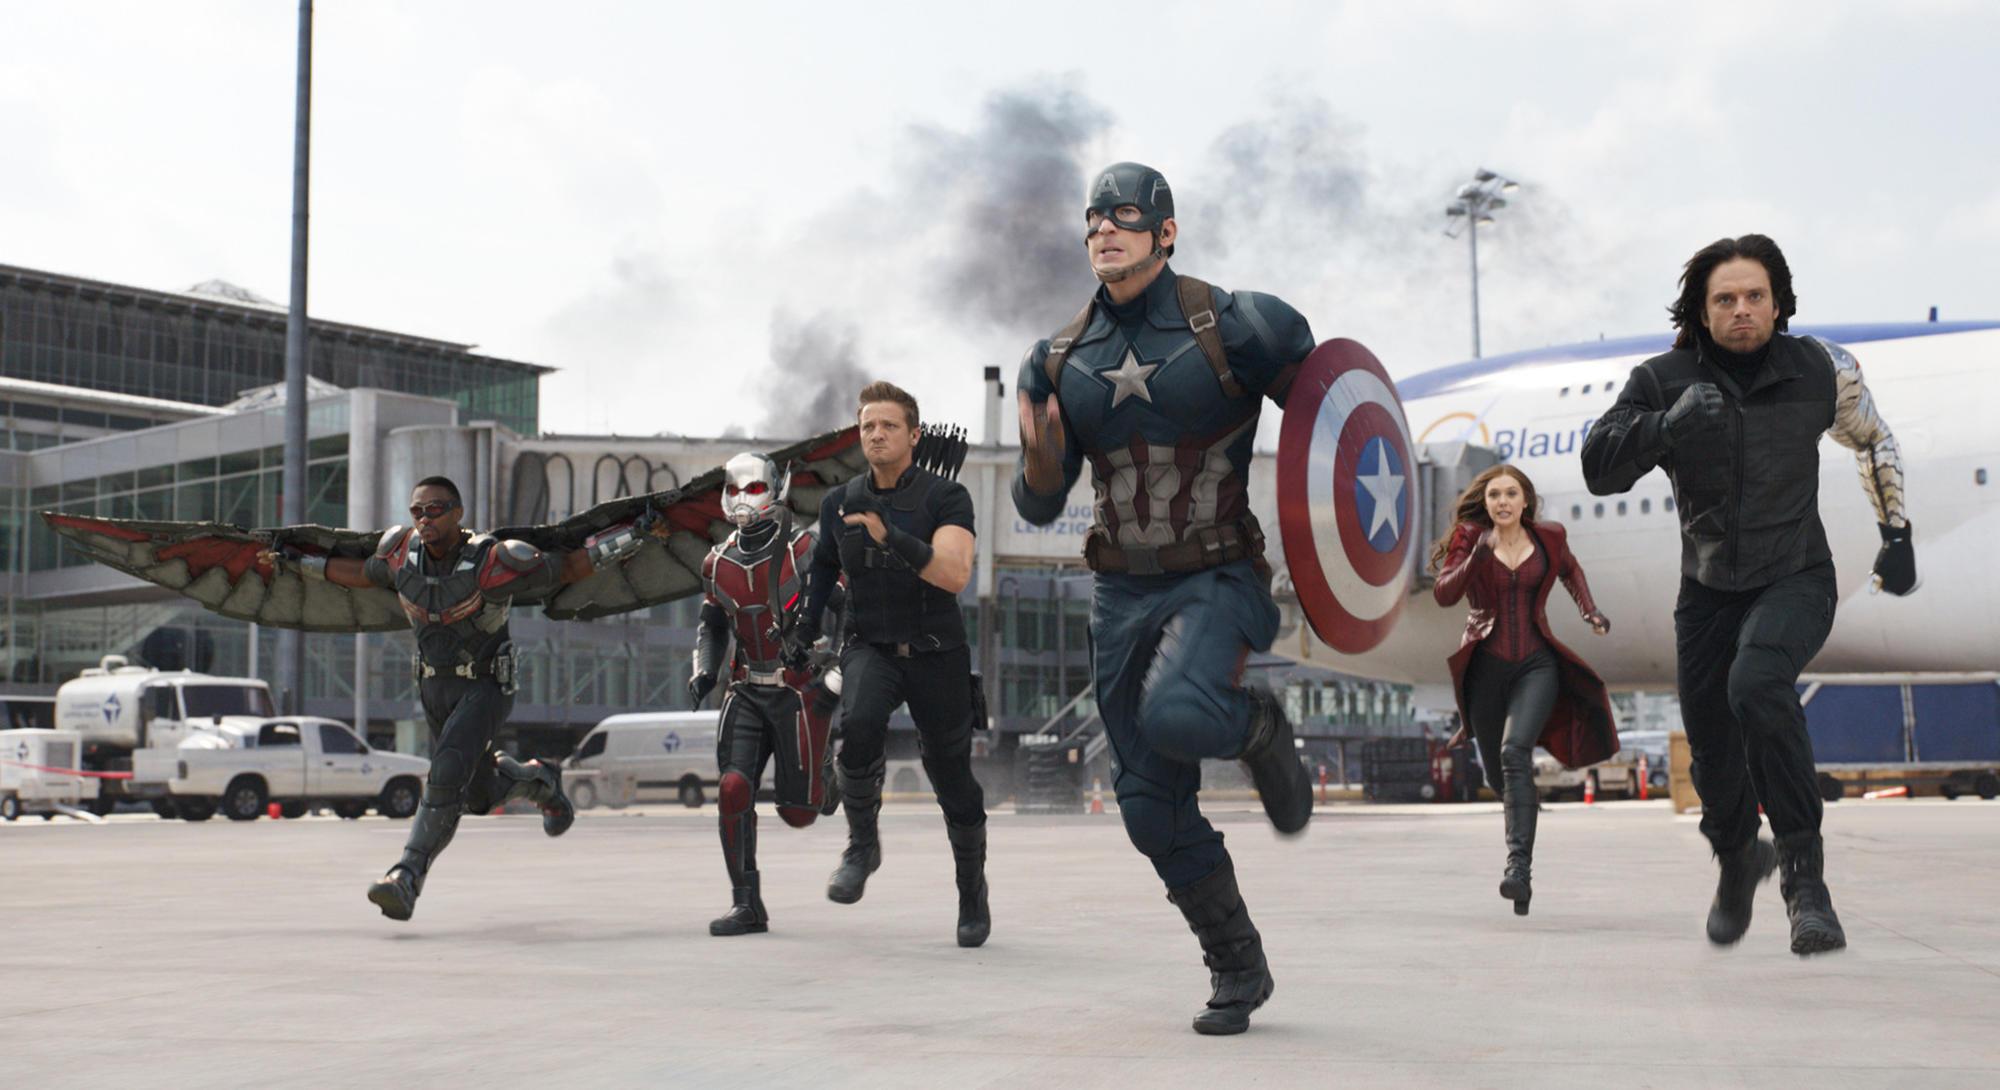 'Captain America: Civil War,' minus the explosions, an ensemble drama like 'The Good Wife'?